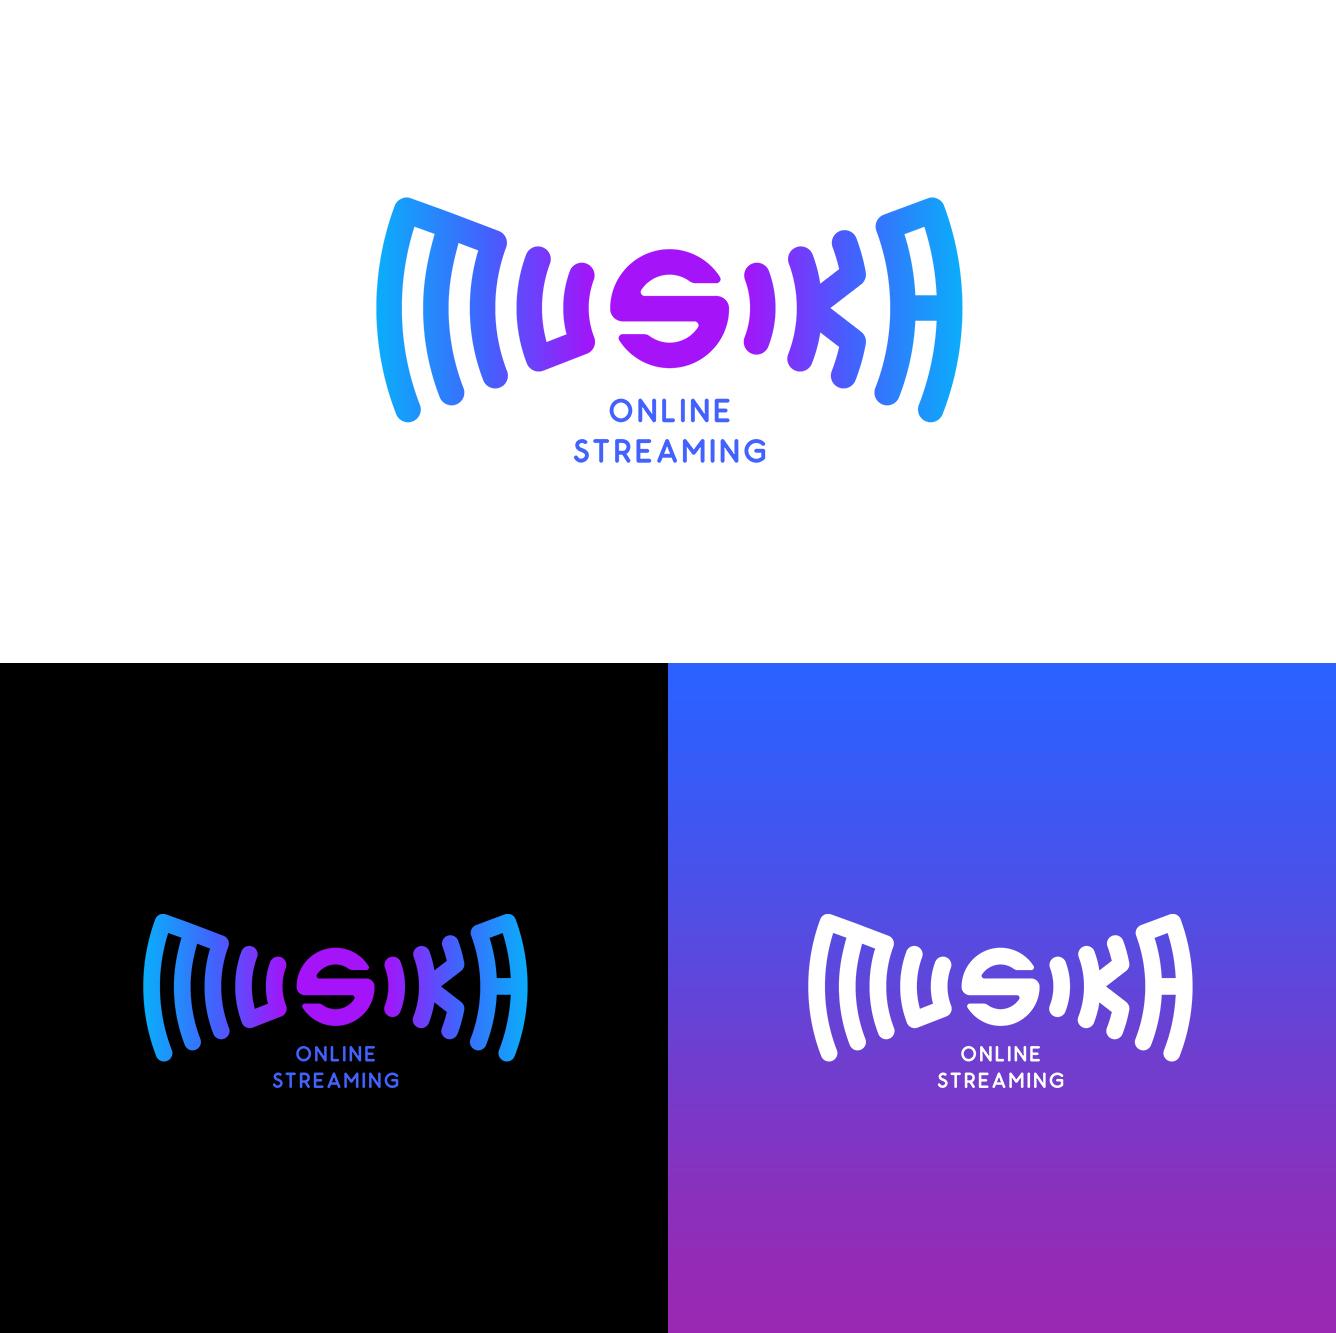 Musika | Fictional music platform logo design